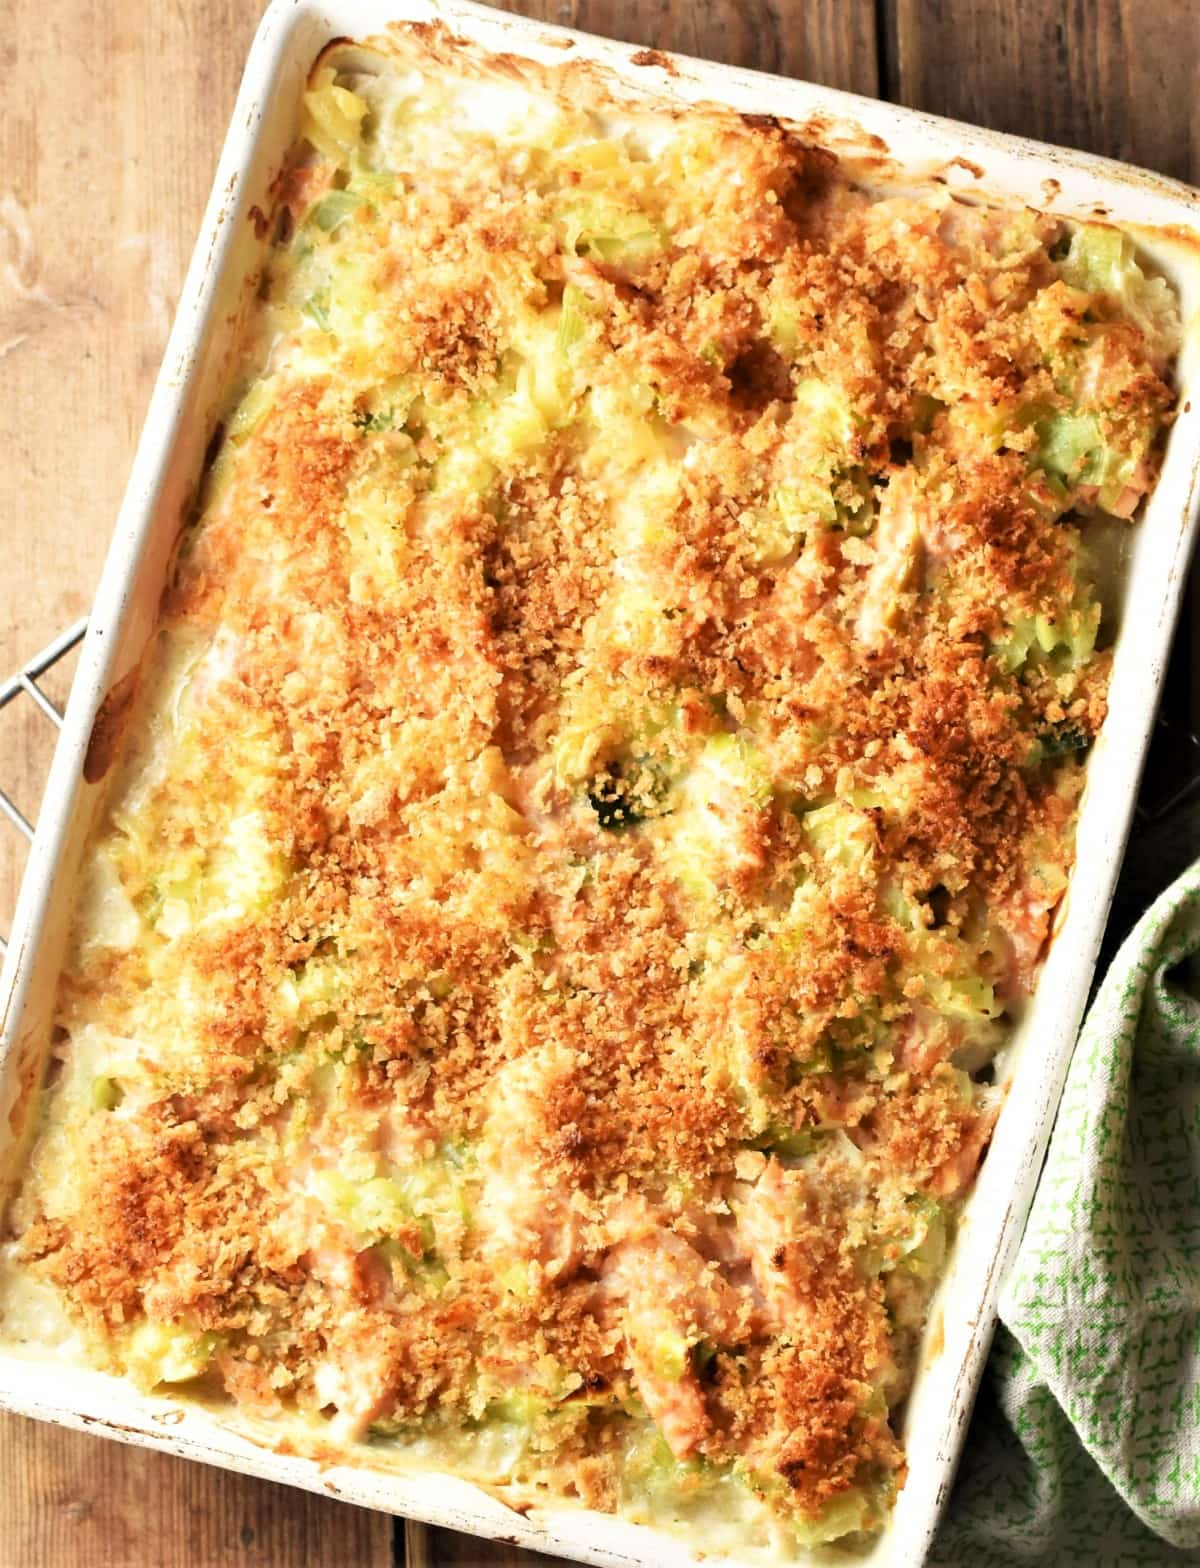 SW recipe: Salmon and Broccoli Bake